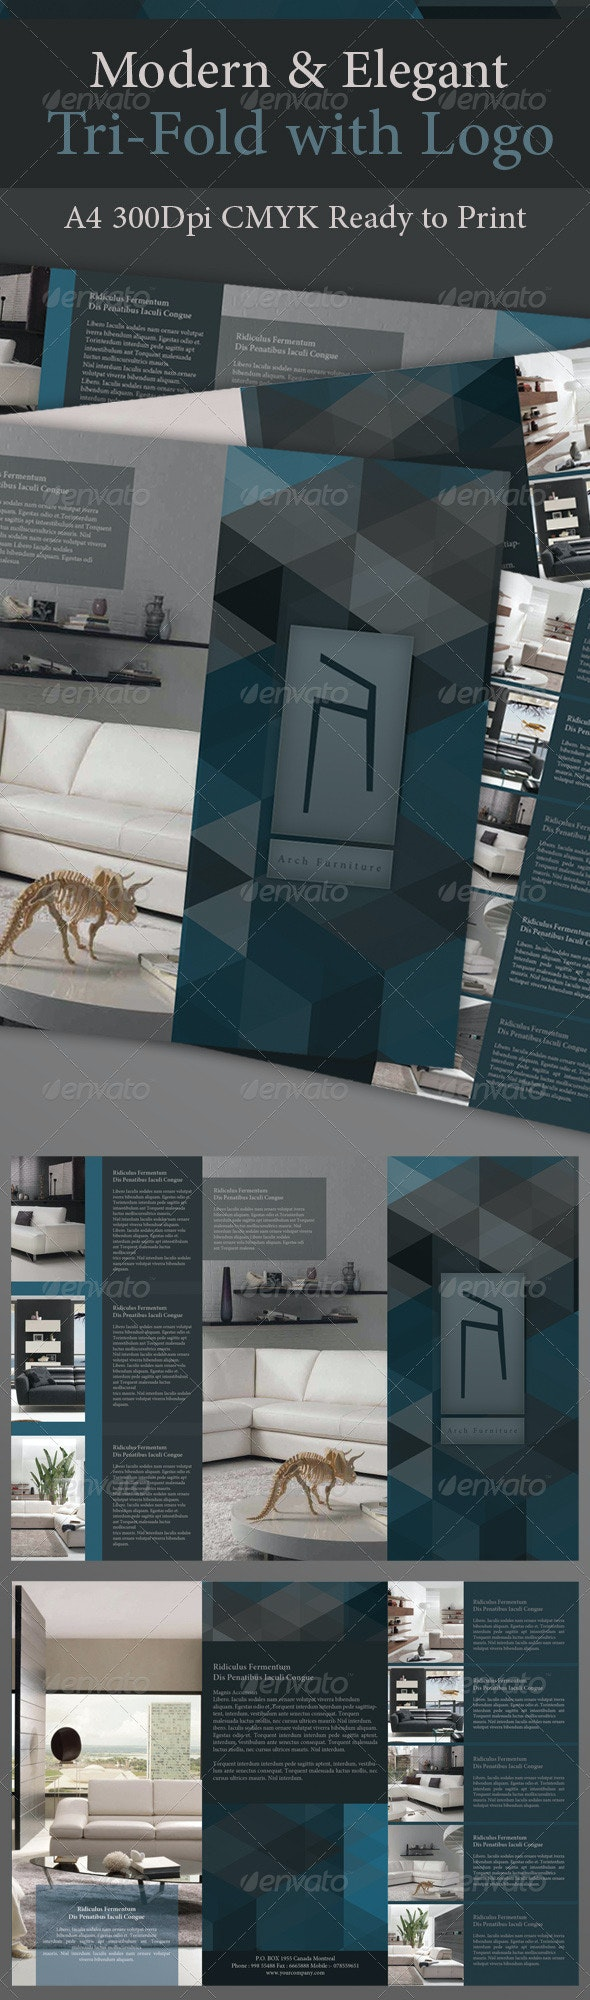 Modern & Elegant Tri-Fold with Logo - Corporate Brochures